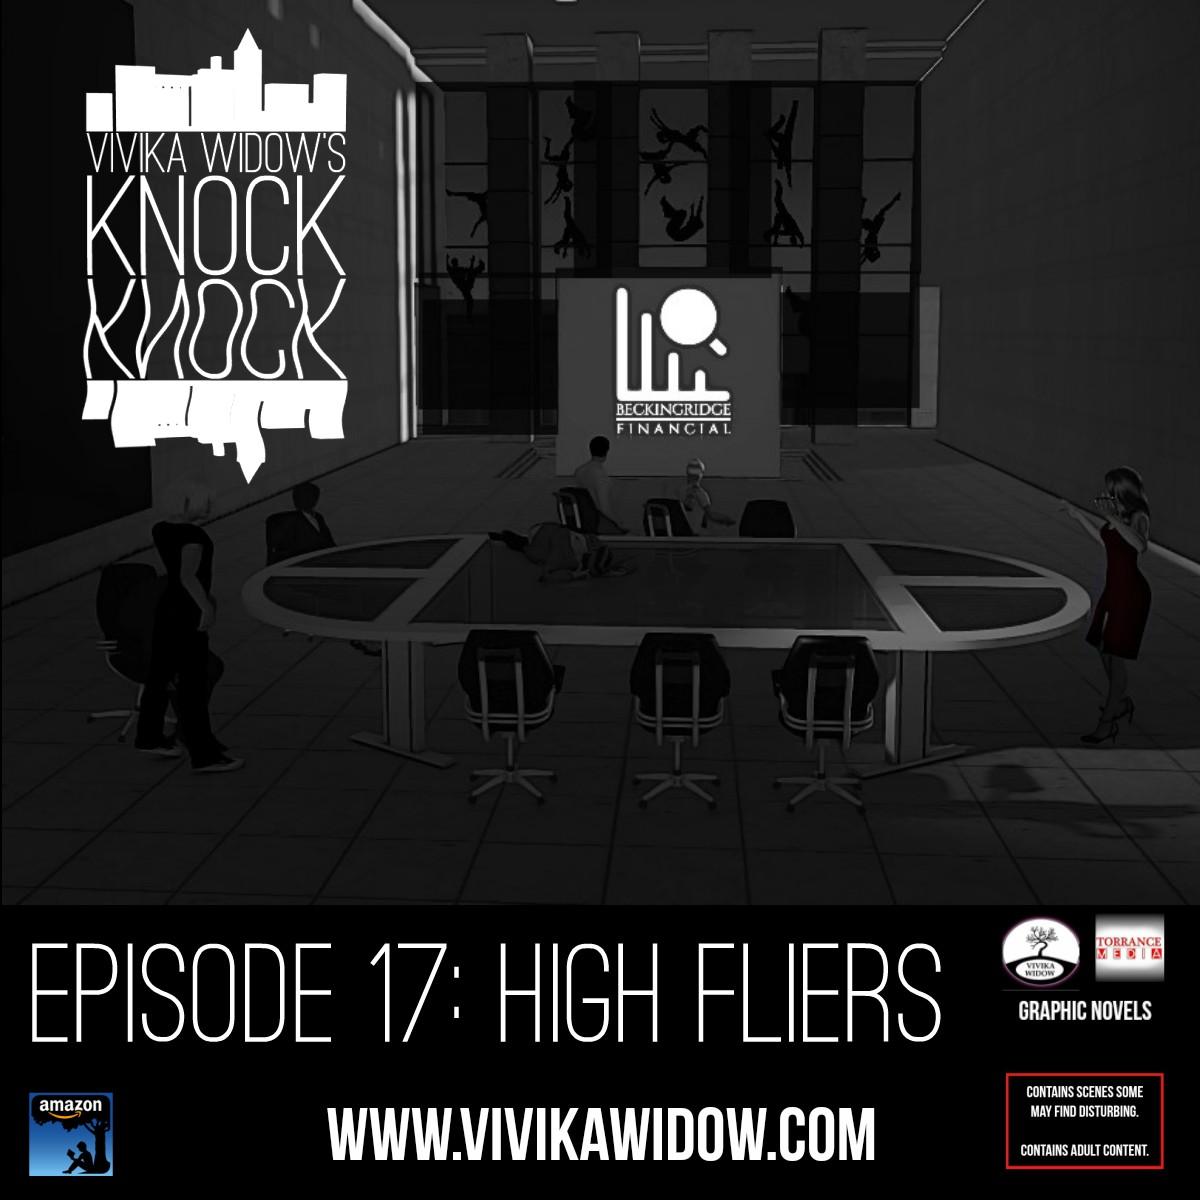 KNOCKKNOCK_issue17_highfliers